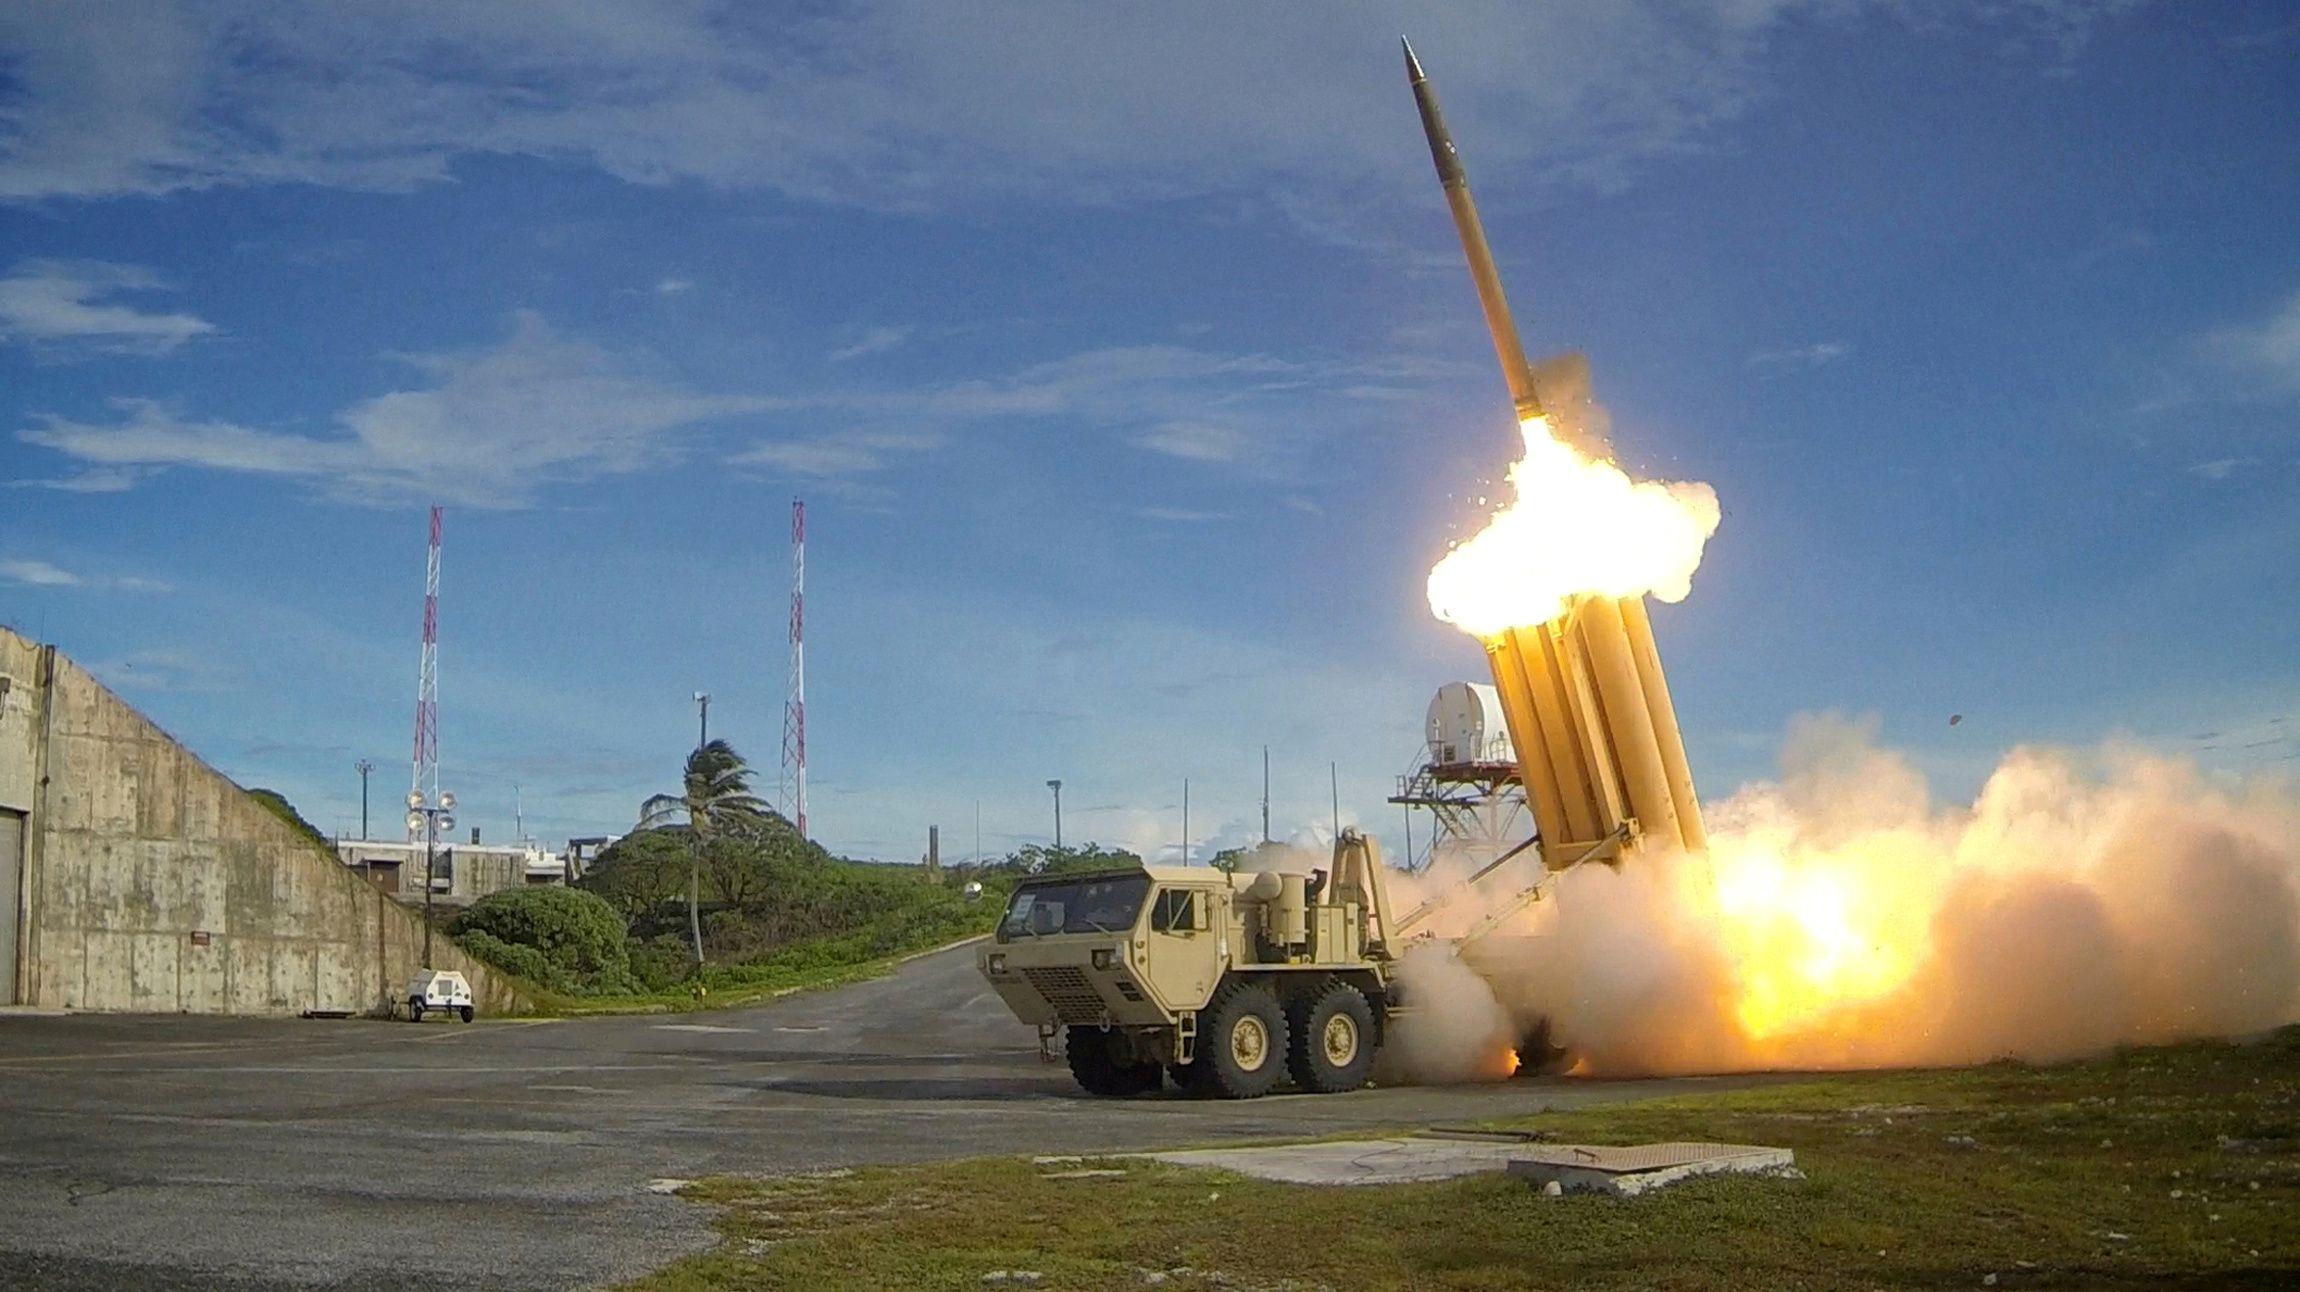 A Terminal High Altitude Area Defense interceptor